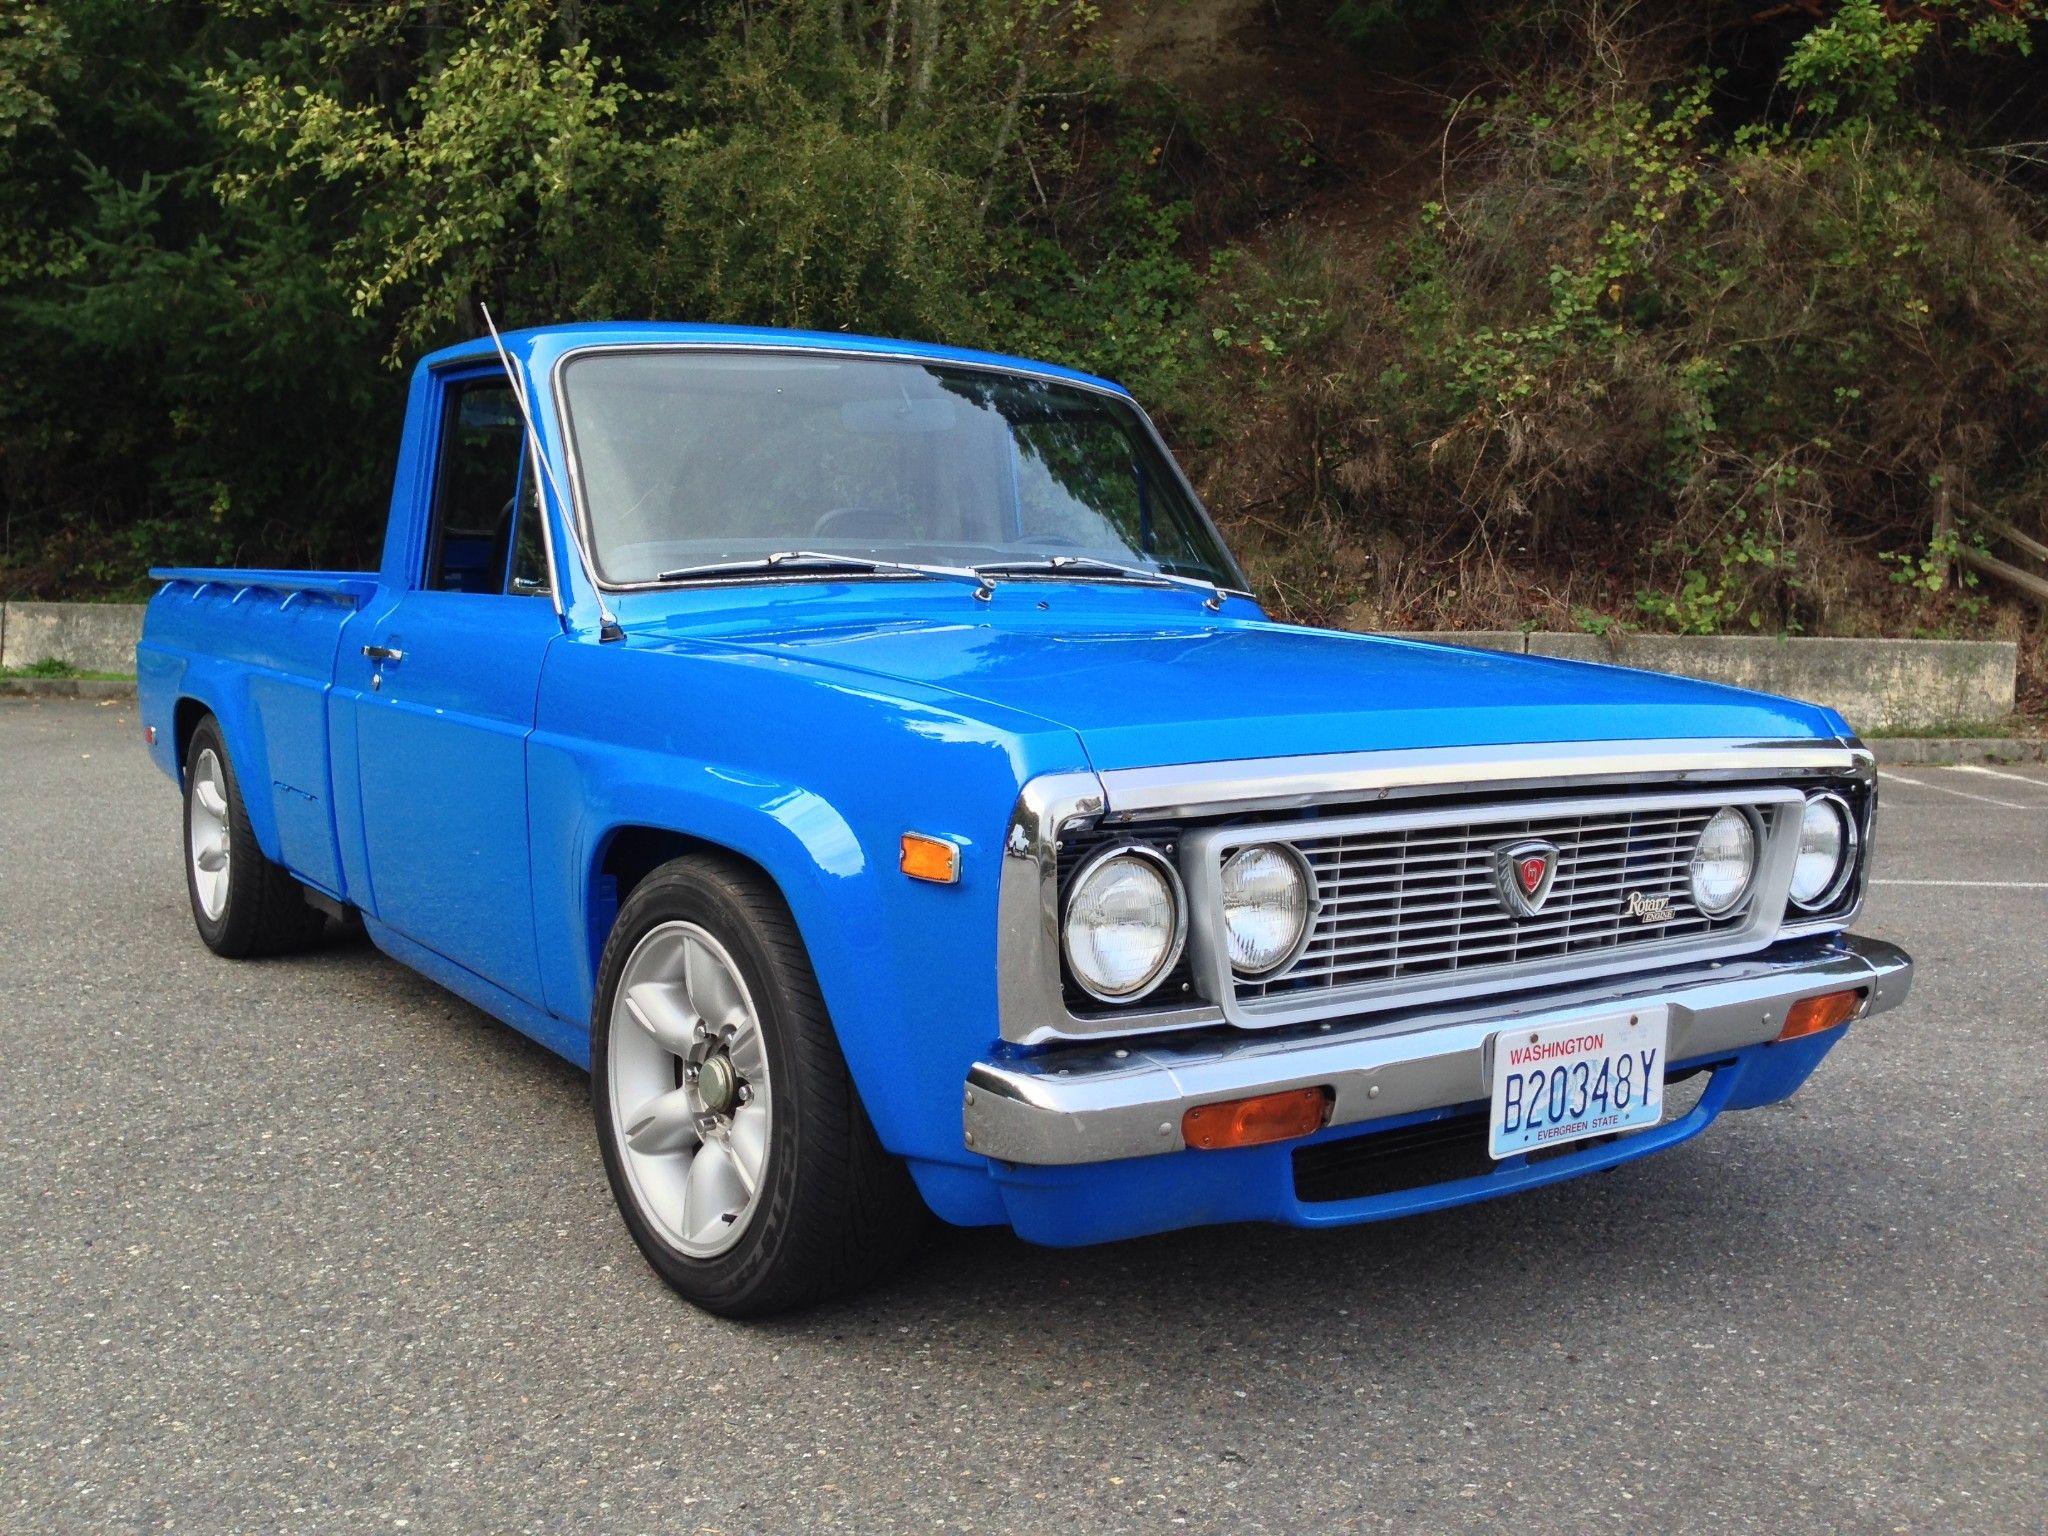 1977 Mazda Rotary Pickup Maintenance/restoration of old/vintage ...